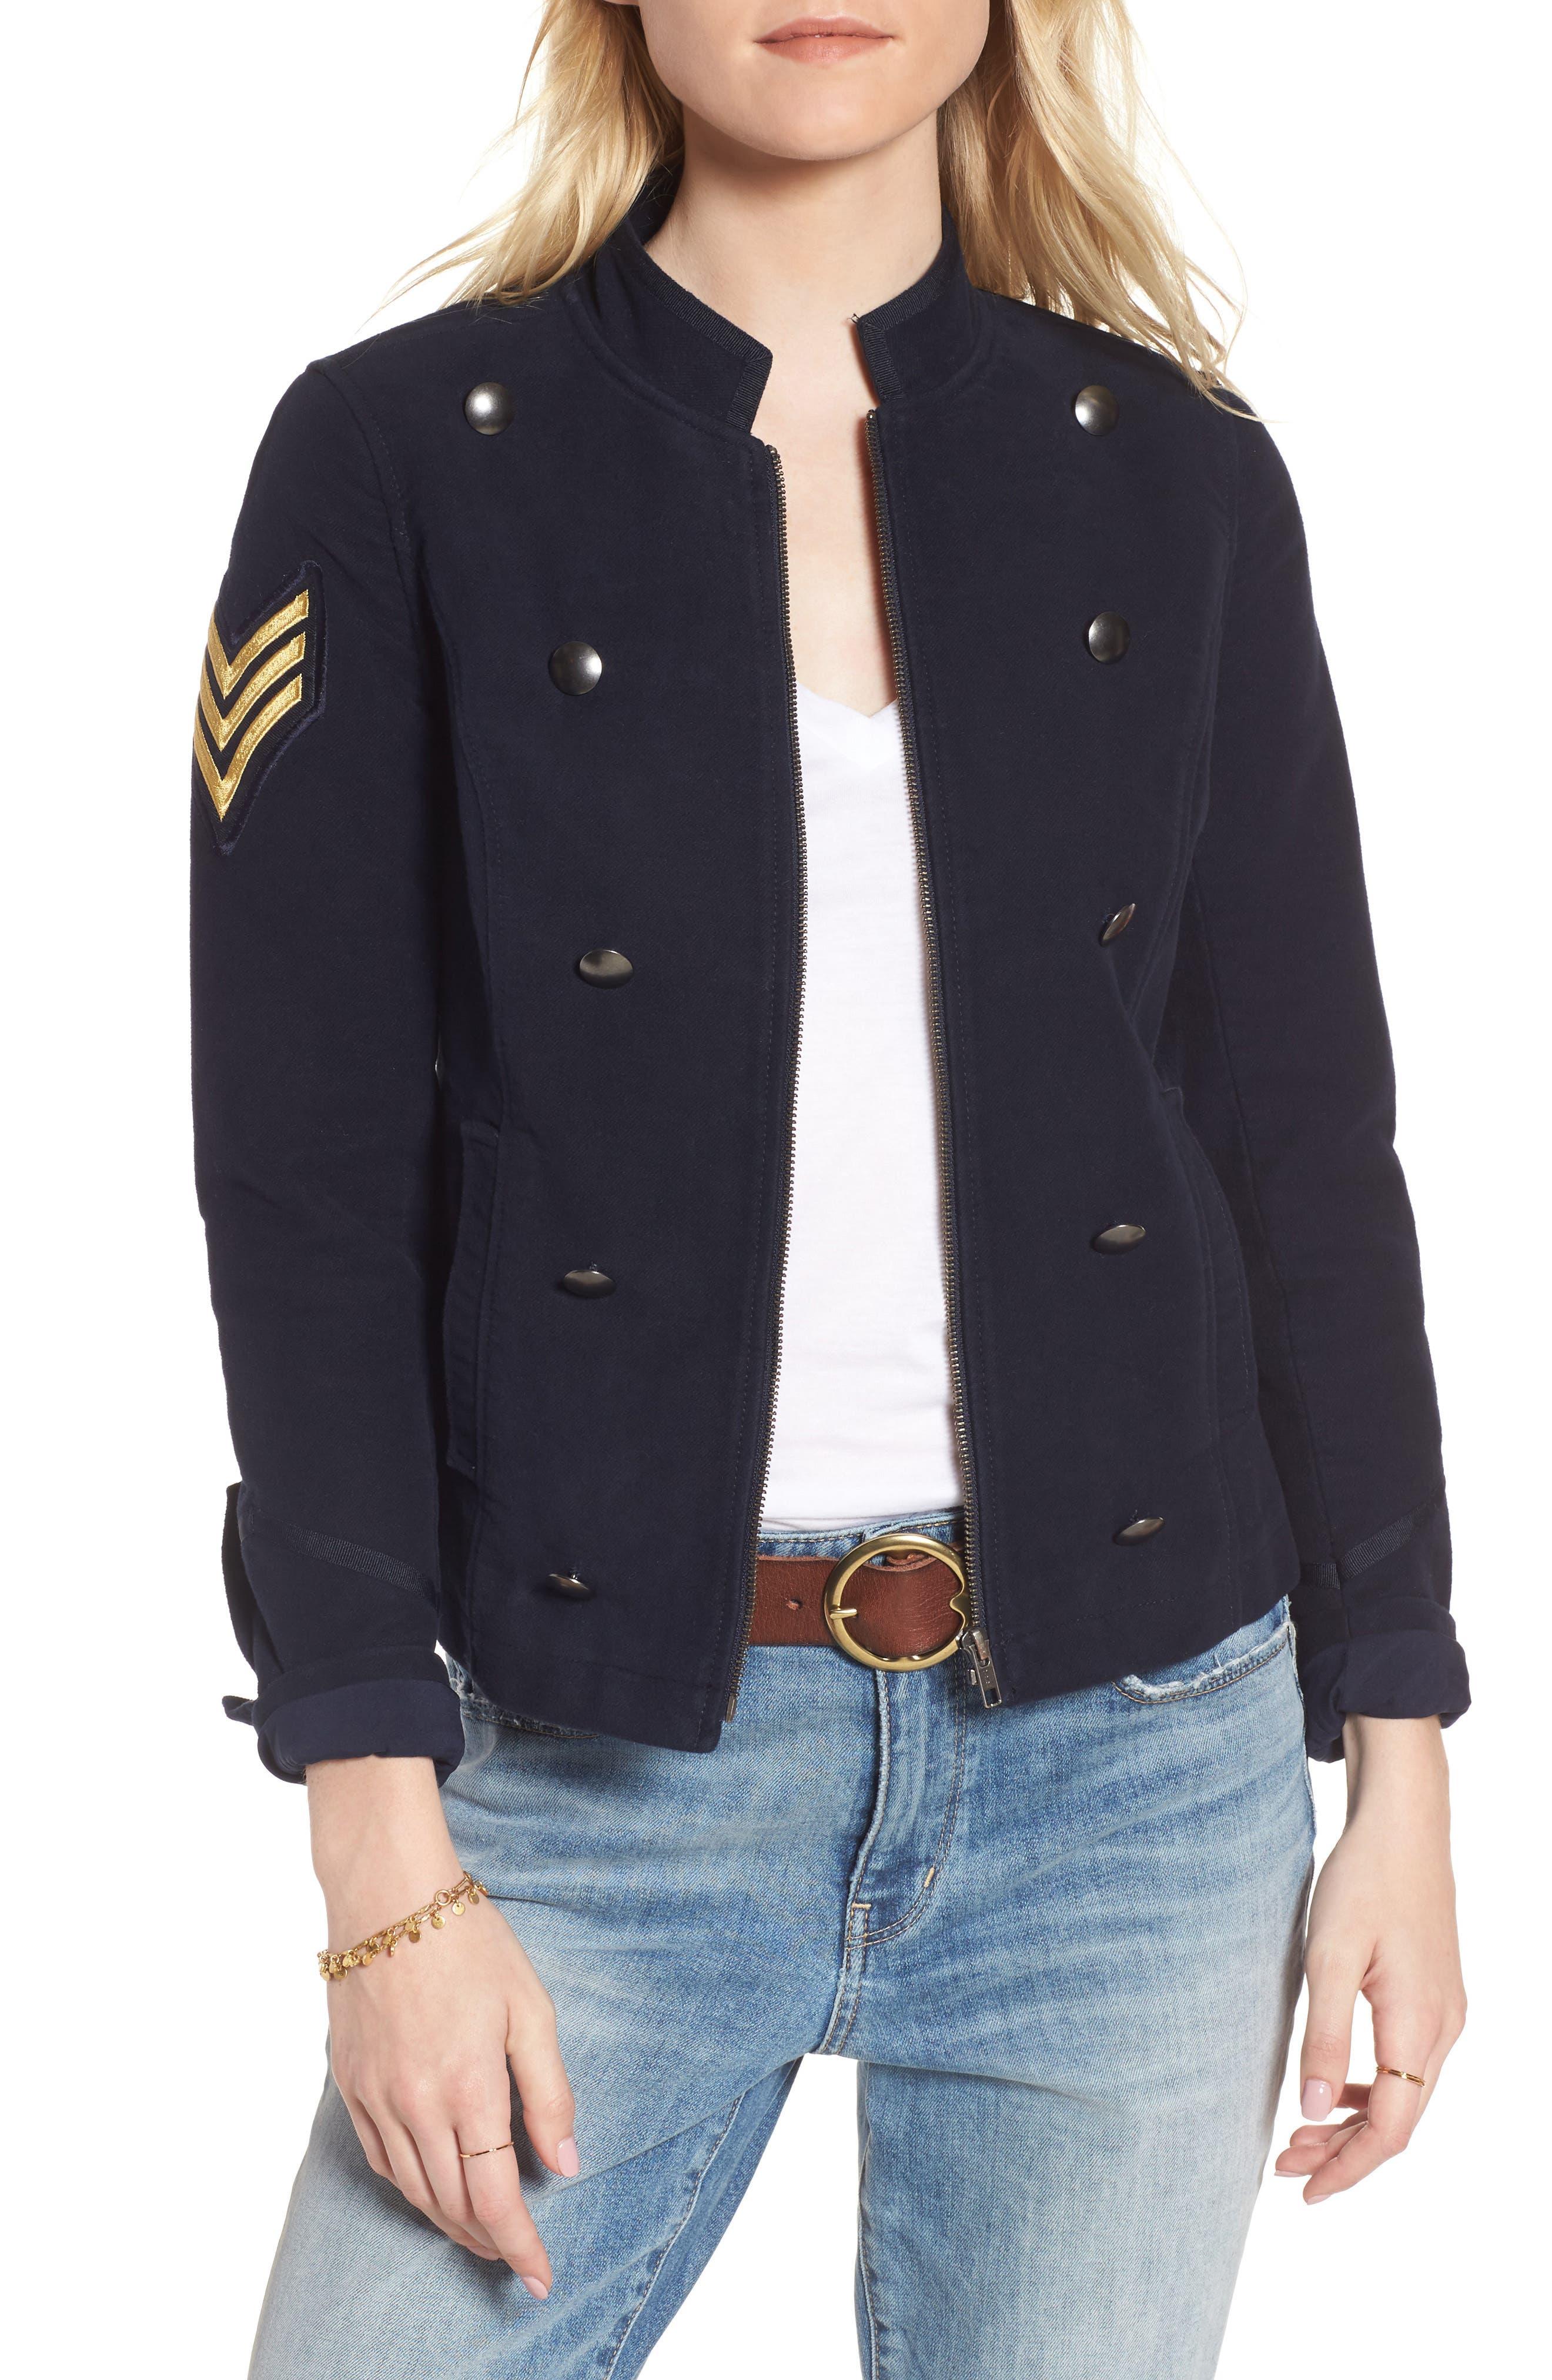 Alternate Image 1 Selected - Treasure & Bond Officers Jacket